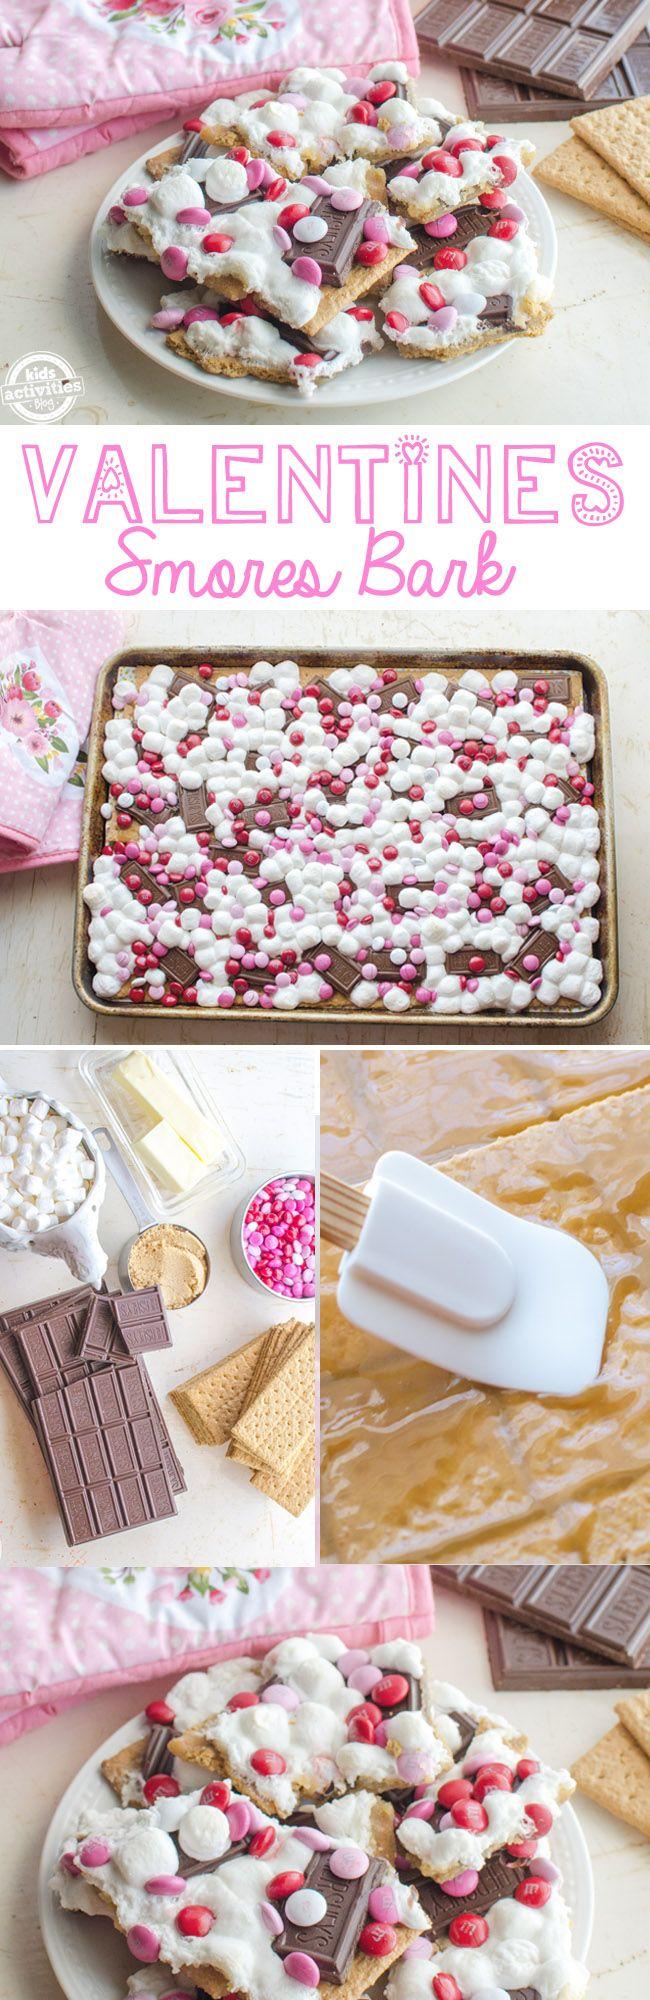 {Valentines Day Dessert} Smores Recipe